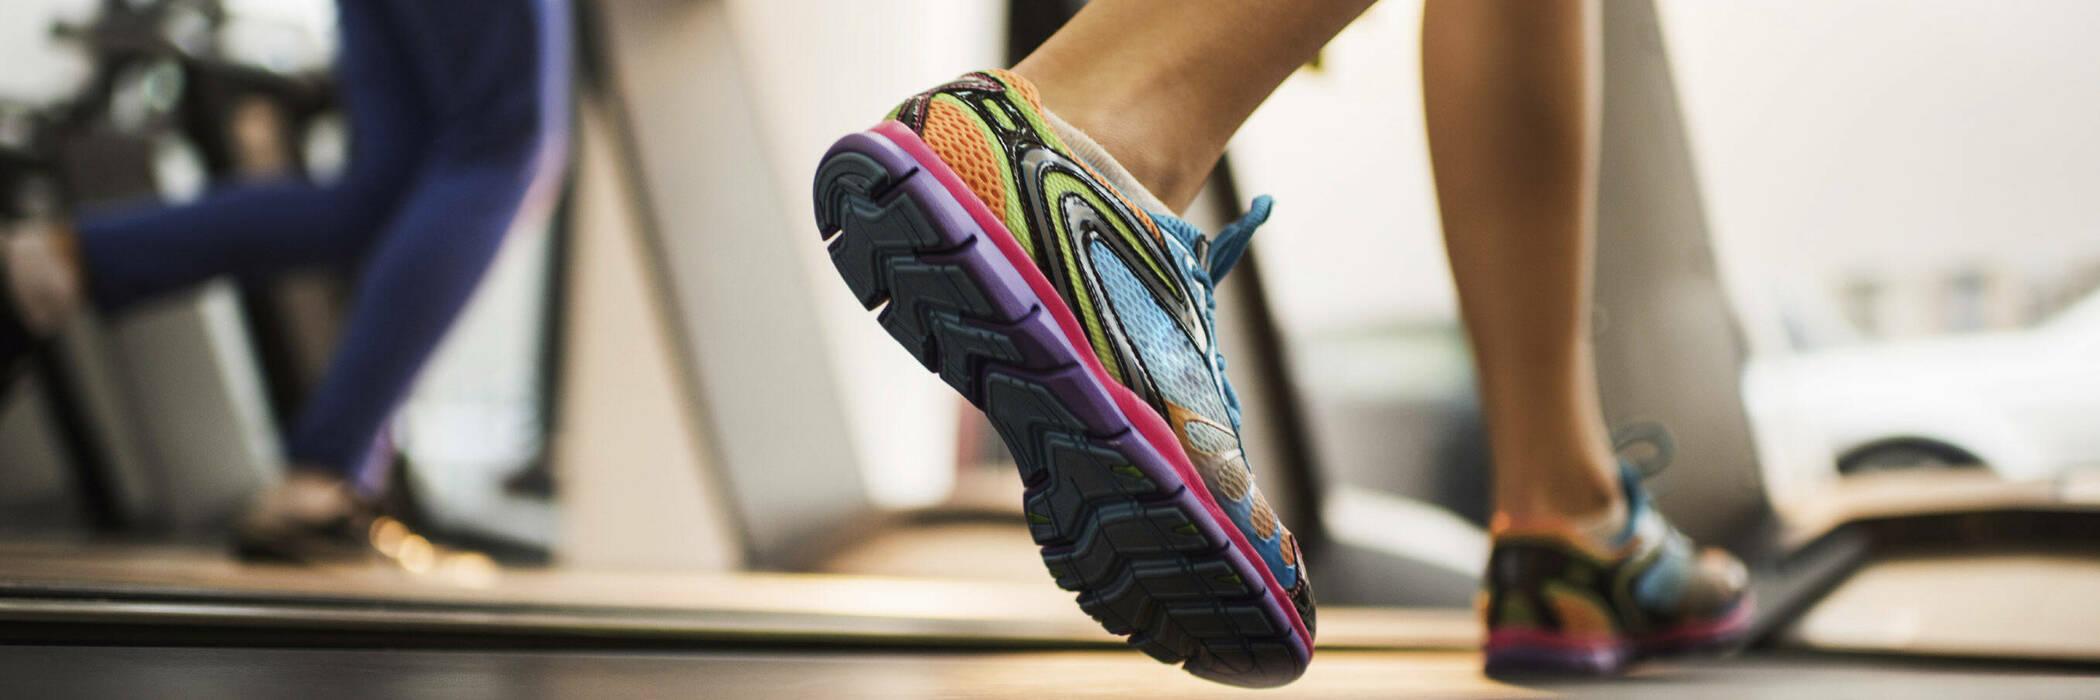 16apr gym terms get workout hero